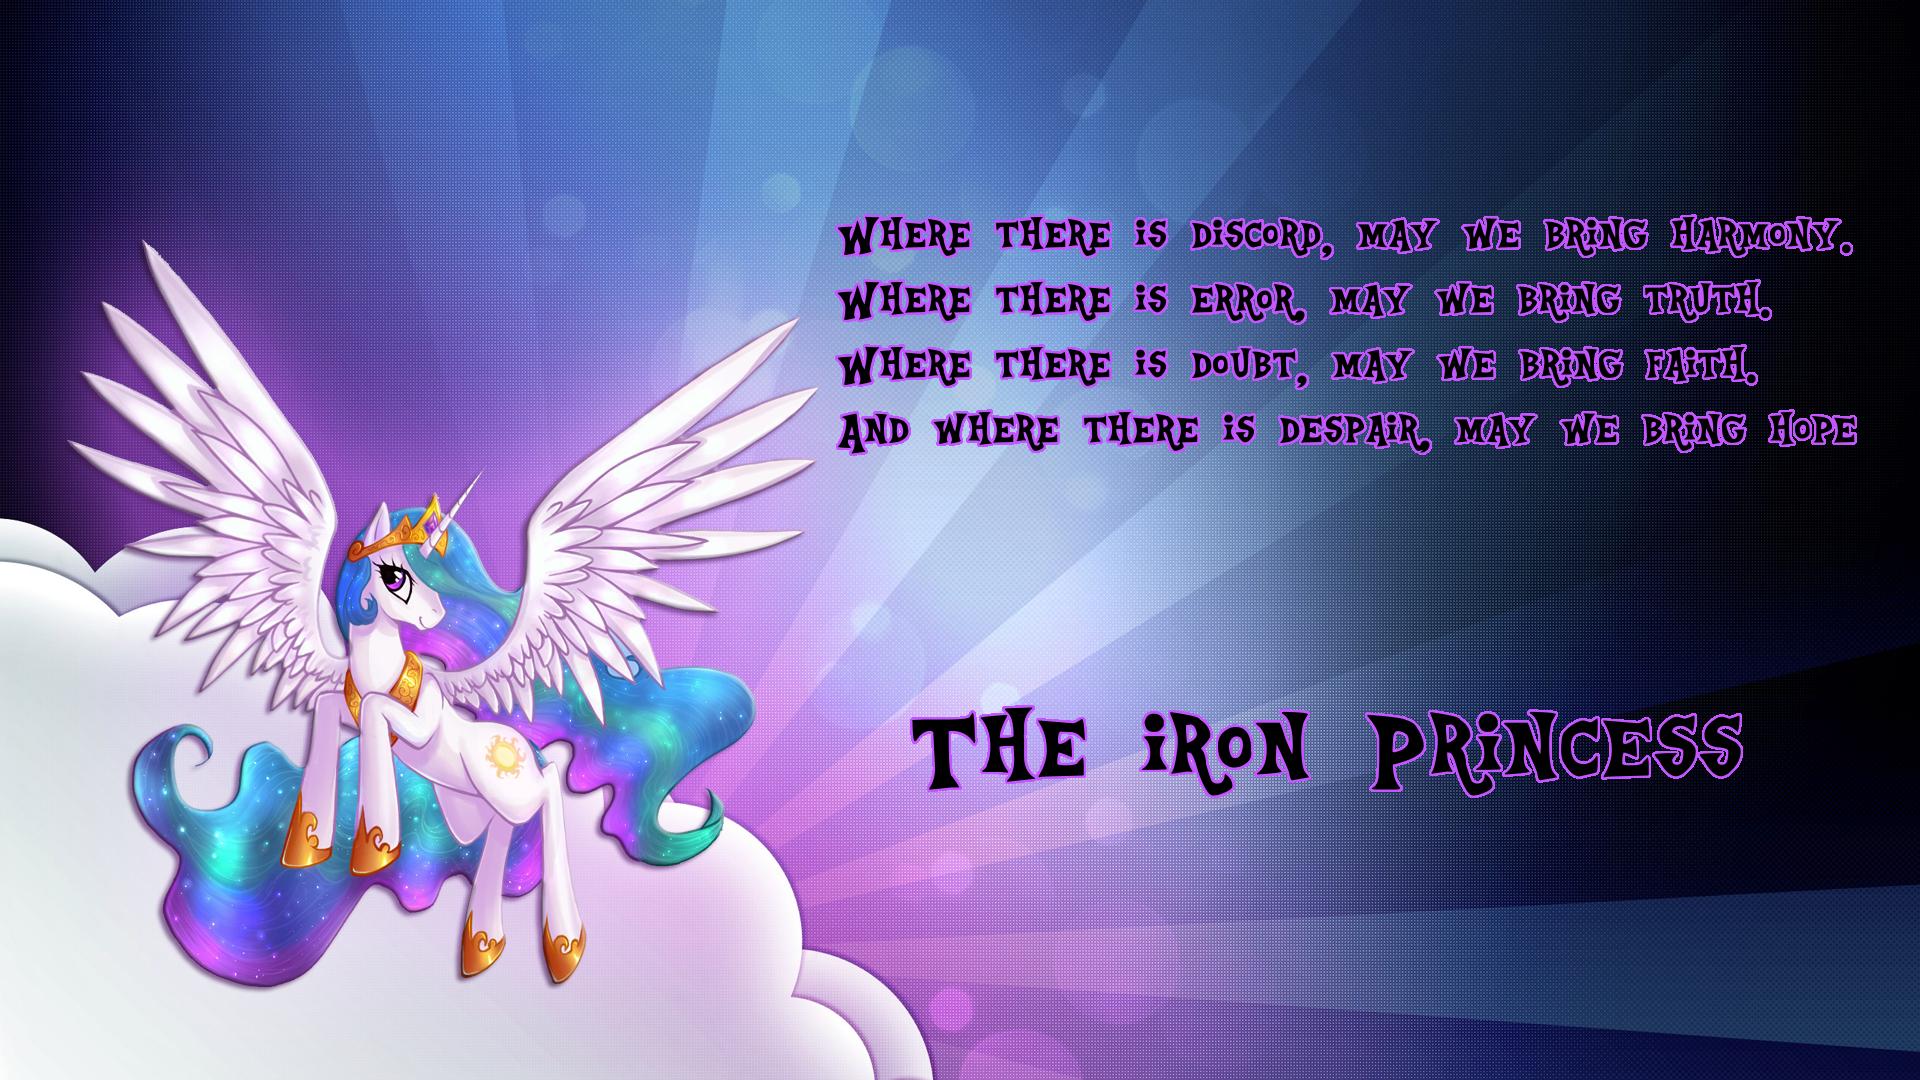 The Iron Princess. In memory of the Iron Princess. Celestia rules w